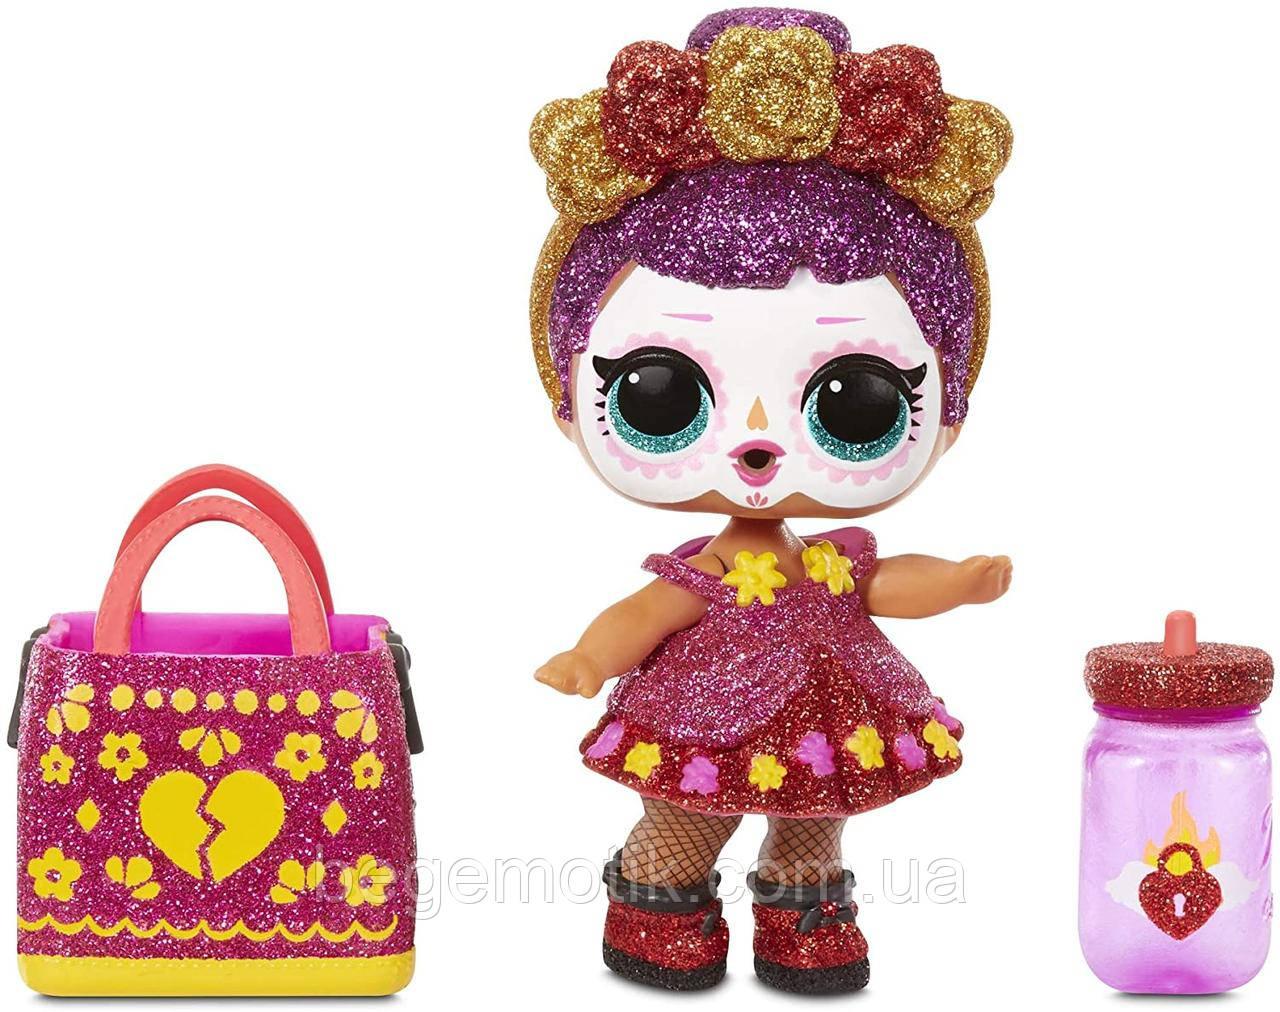 Кукла ЛОЛ Беби Бонита L.O.L. Surprise! Spooky Sparkle Limited Edition Bebé Bonita 572459